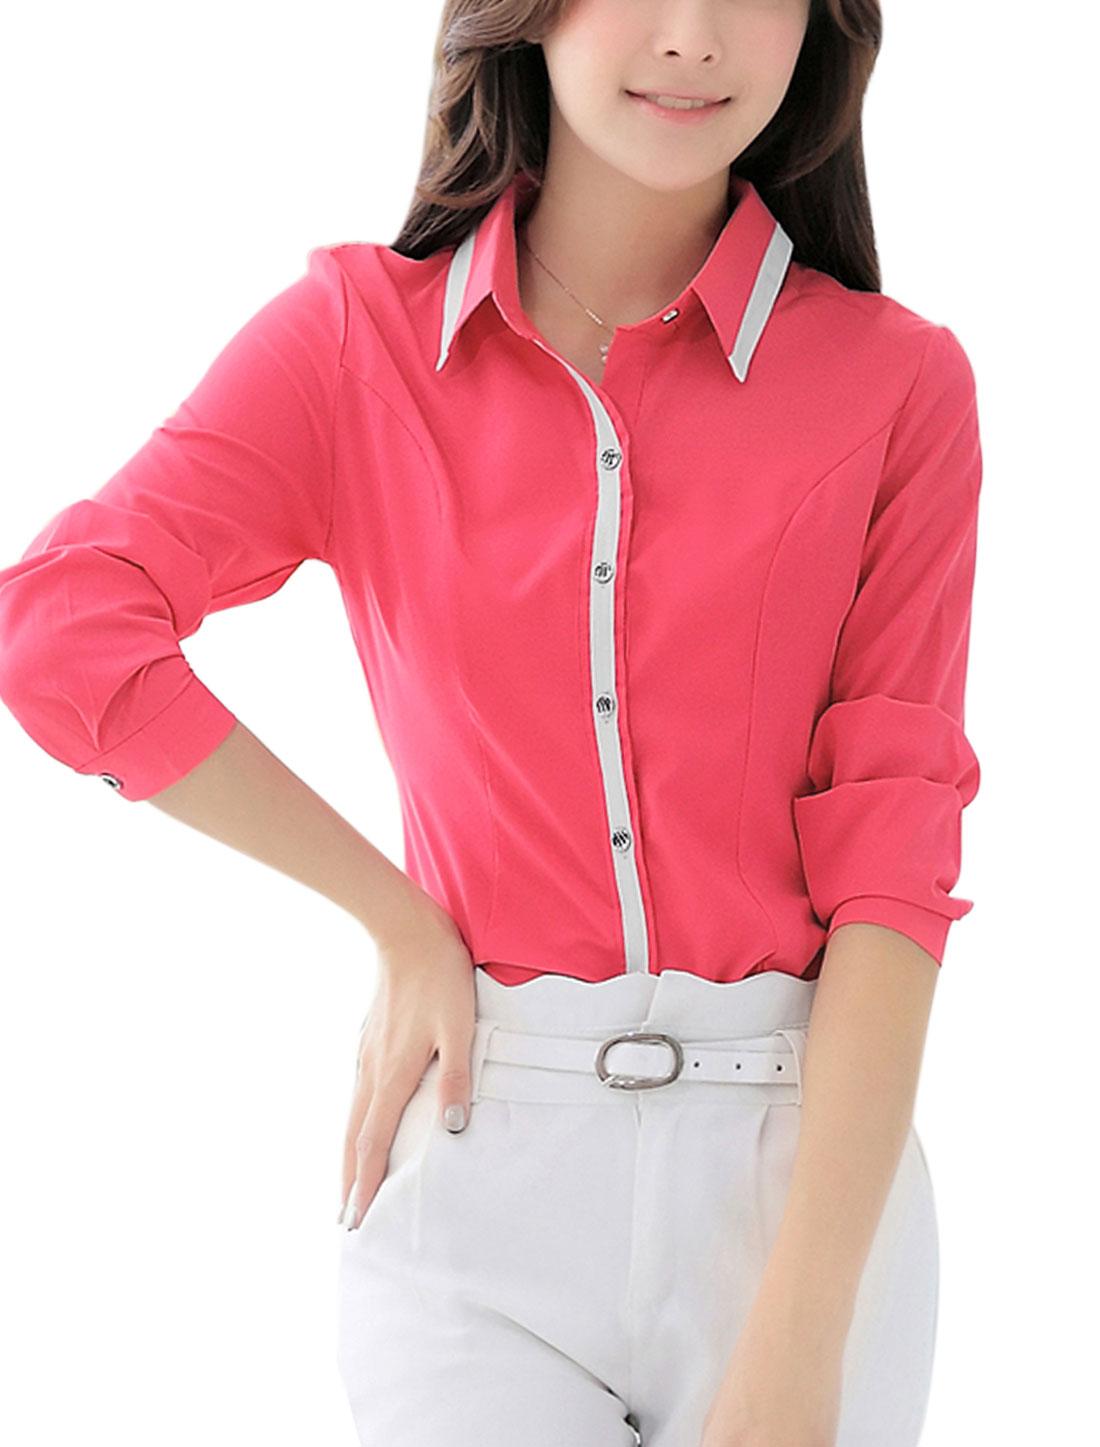 Ladies Slim Fit Point Collar Button Up Fuchsia Shirt M